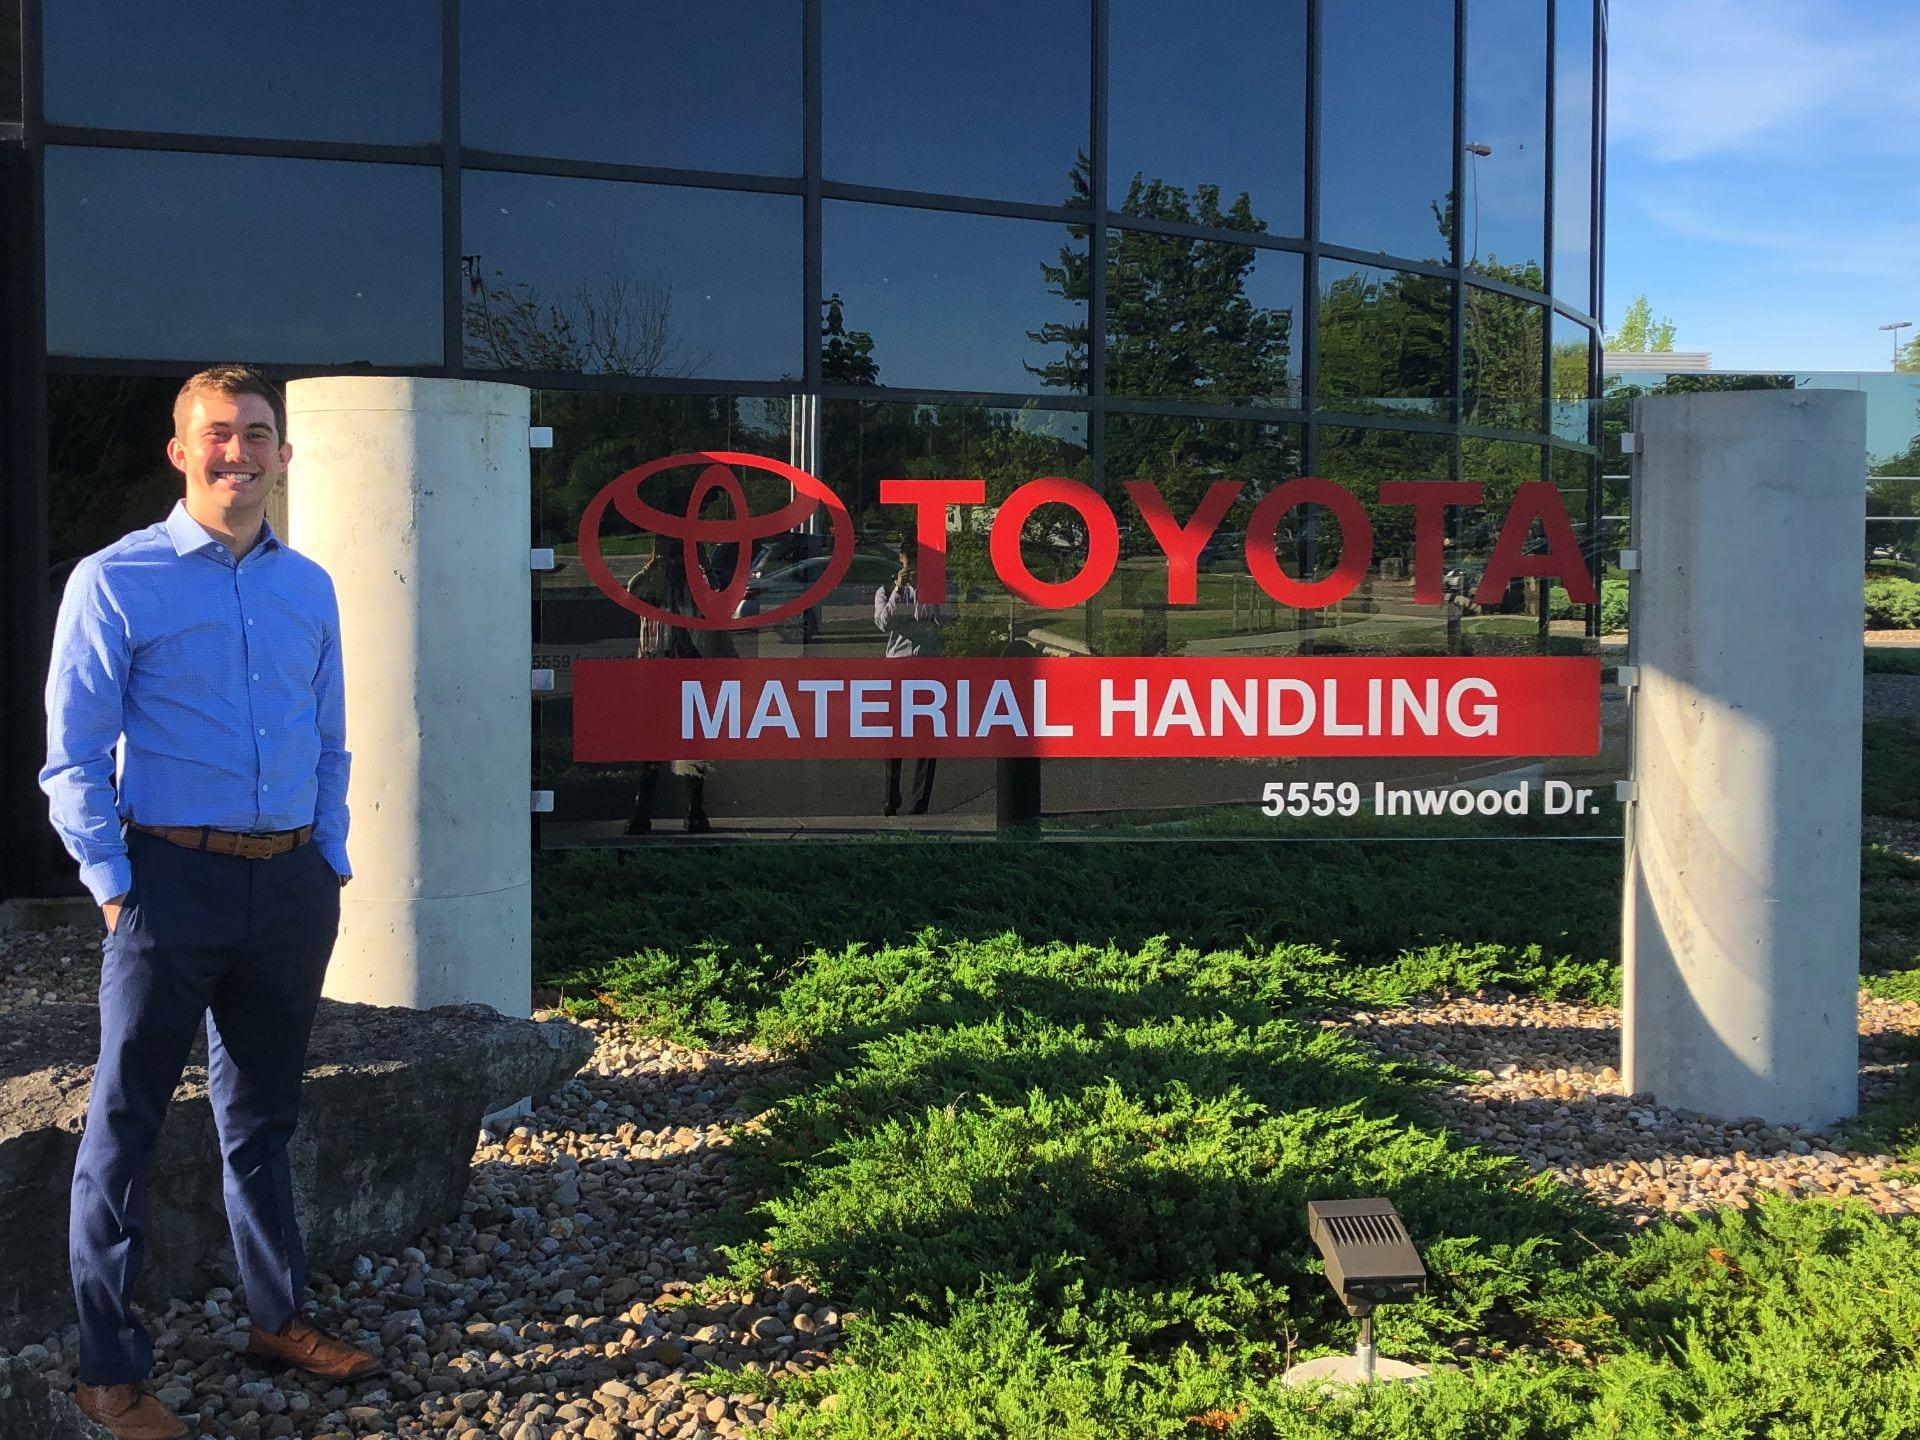 Toyota Columbus Indiana >> Toyota Material Handling Kelley School Of Business